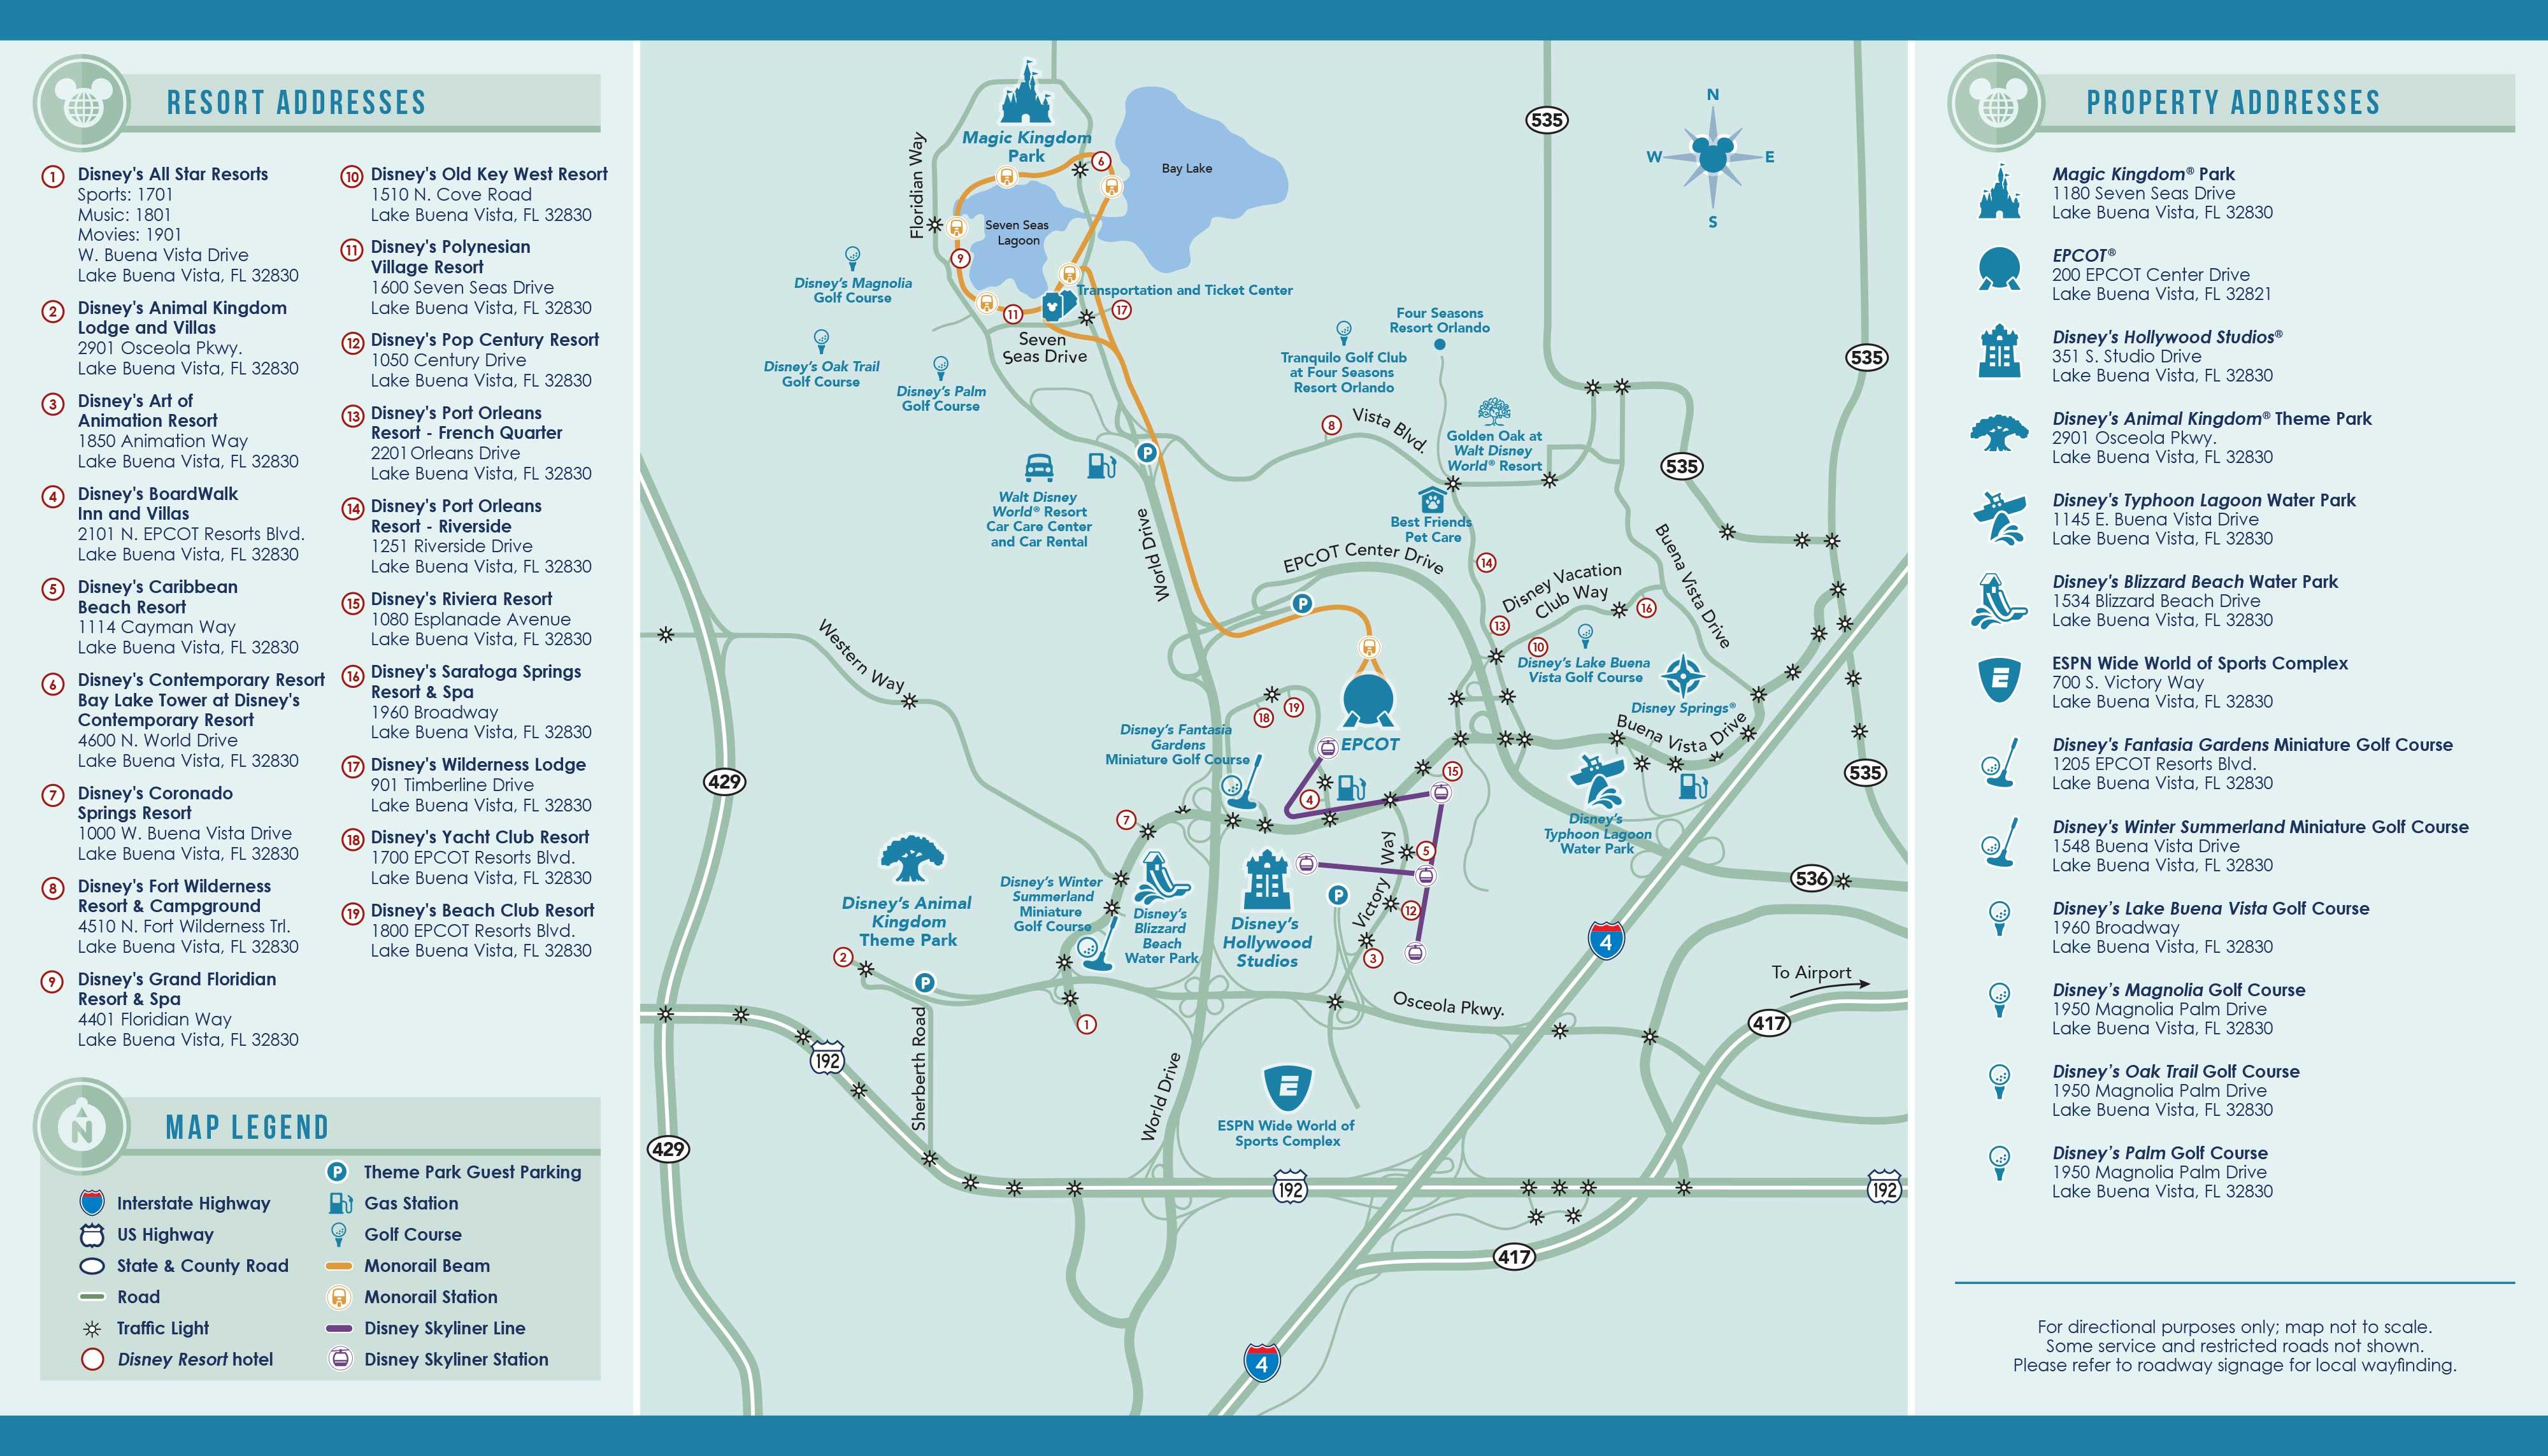 Walt Disney World Property Map September 2020